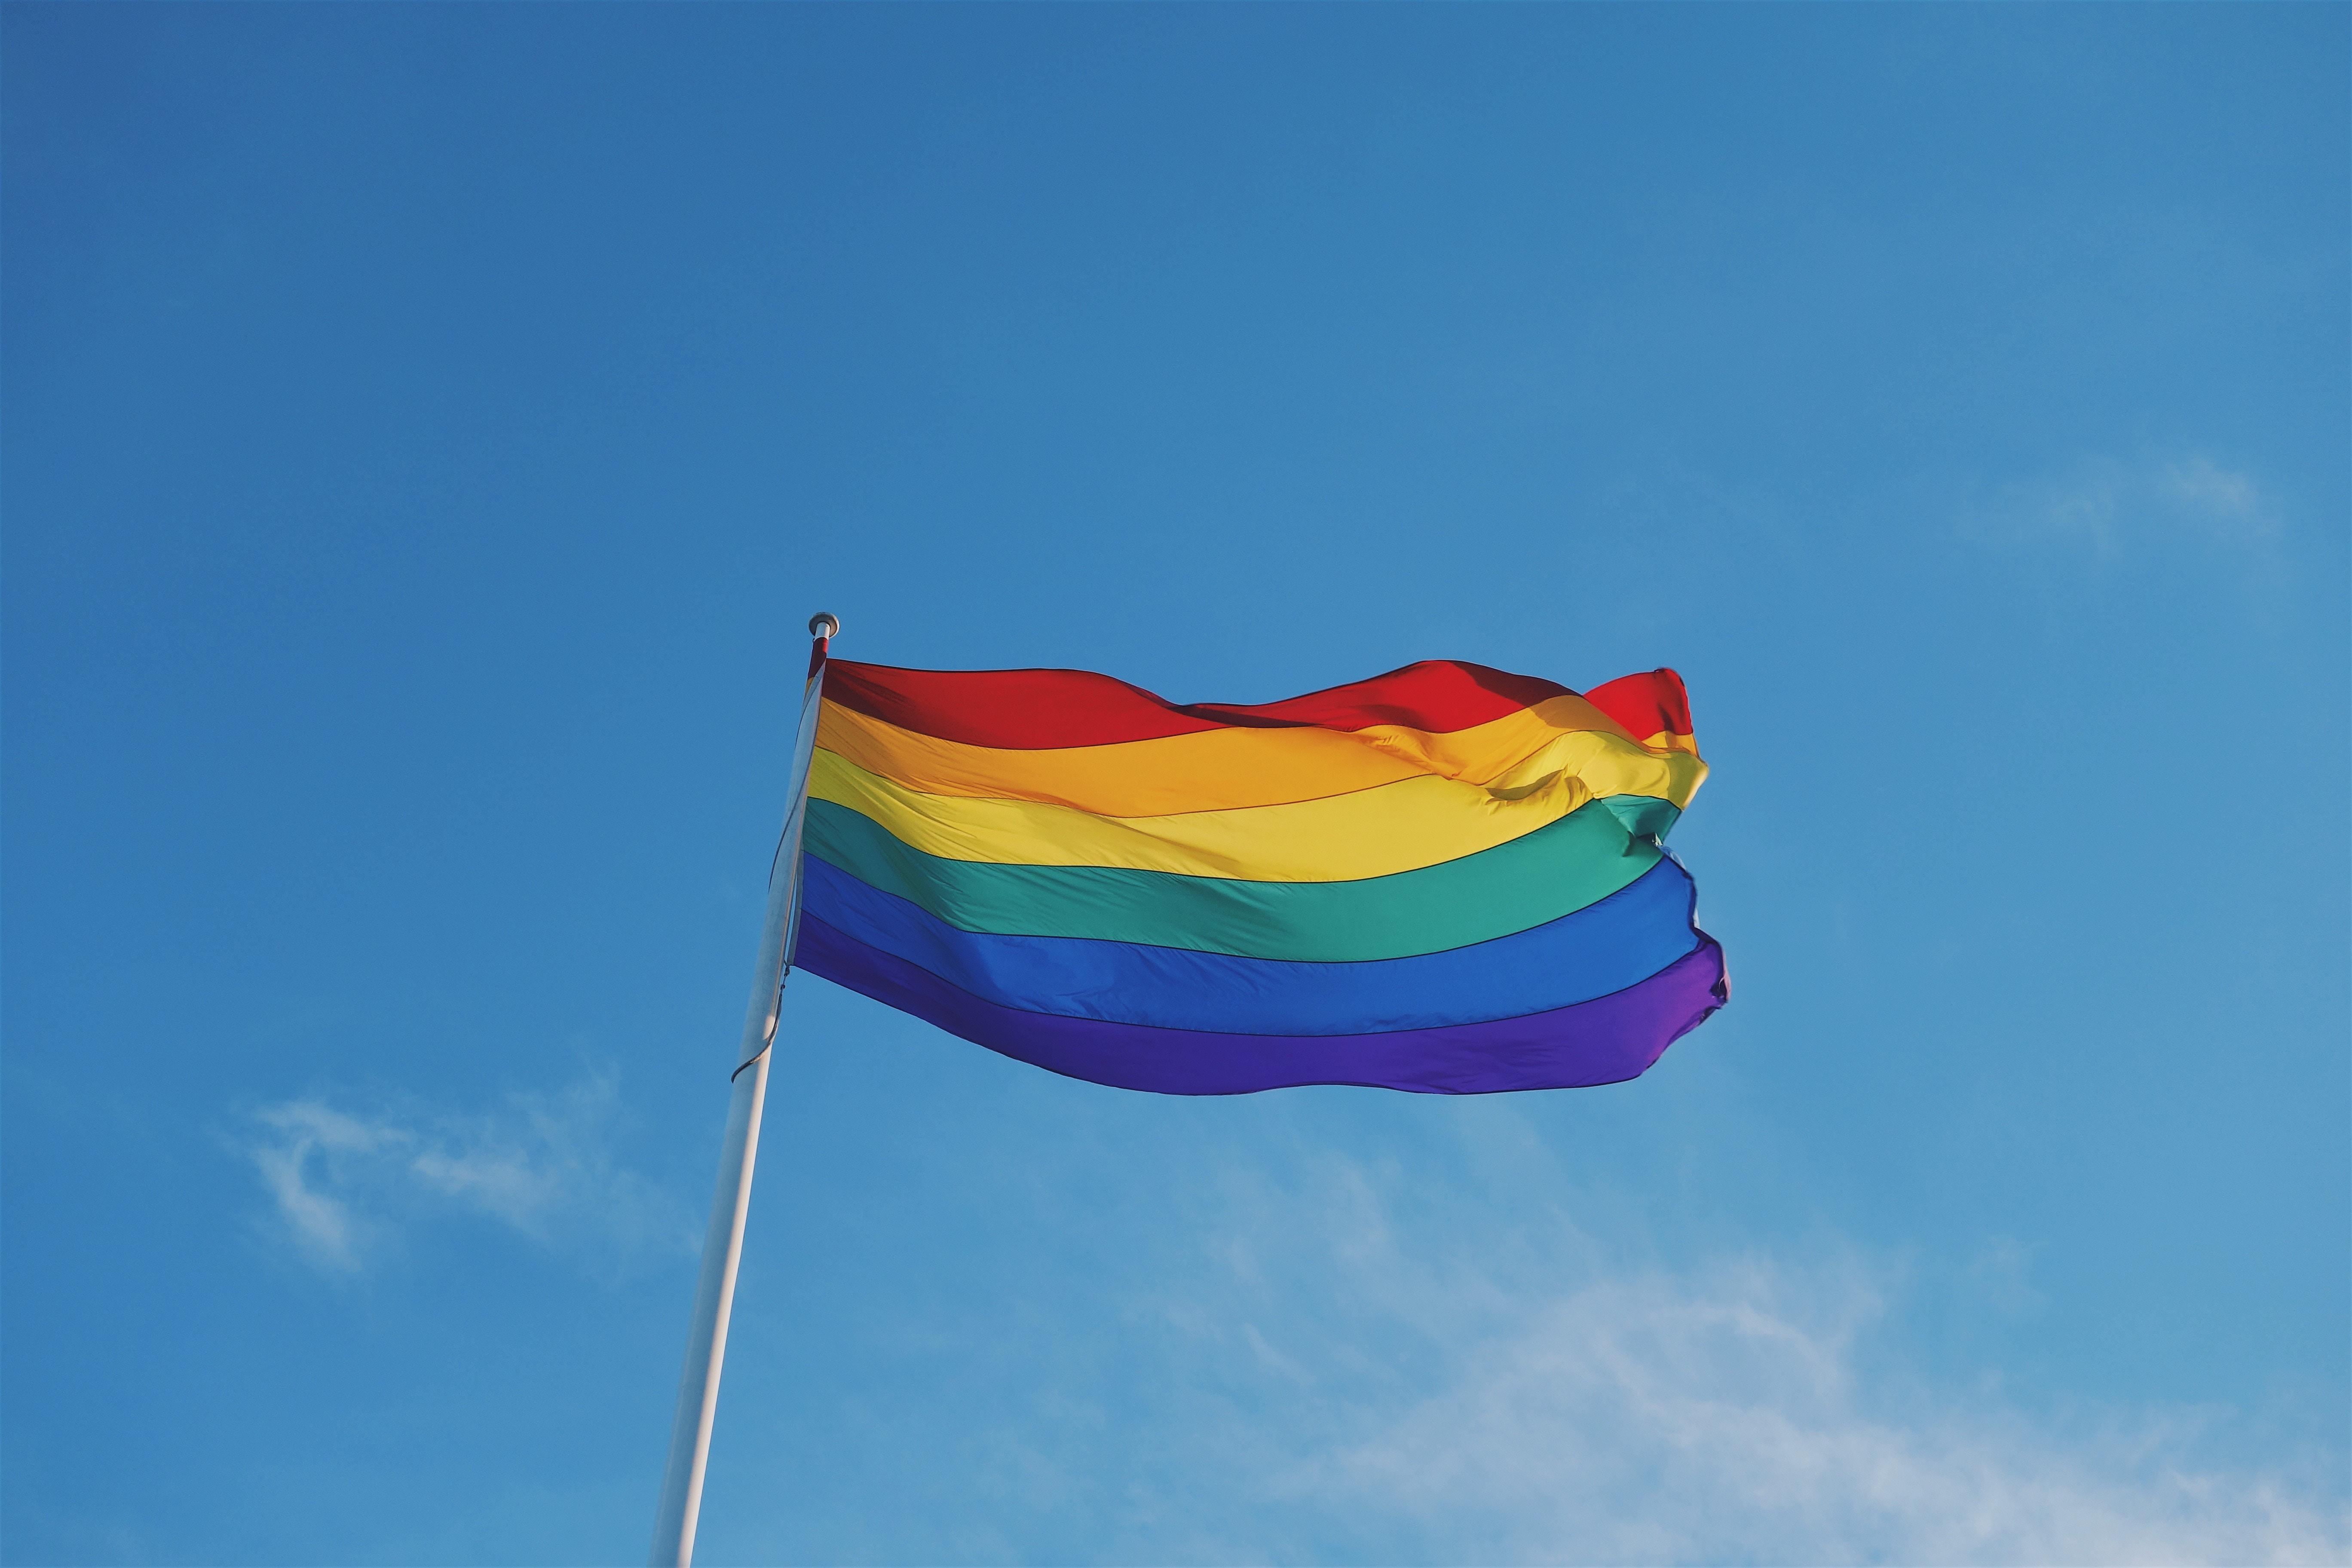 LGBT flag raising during daytime